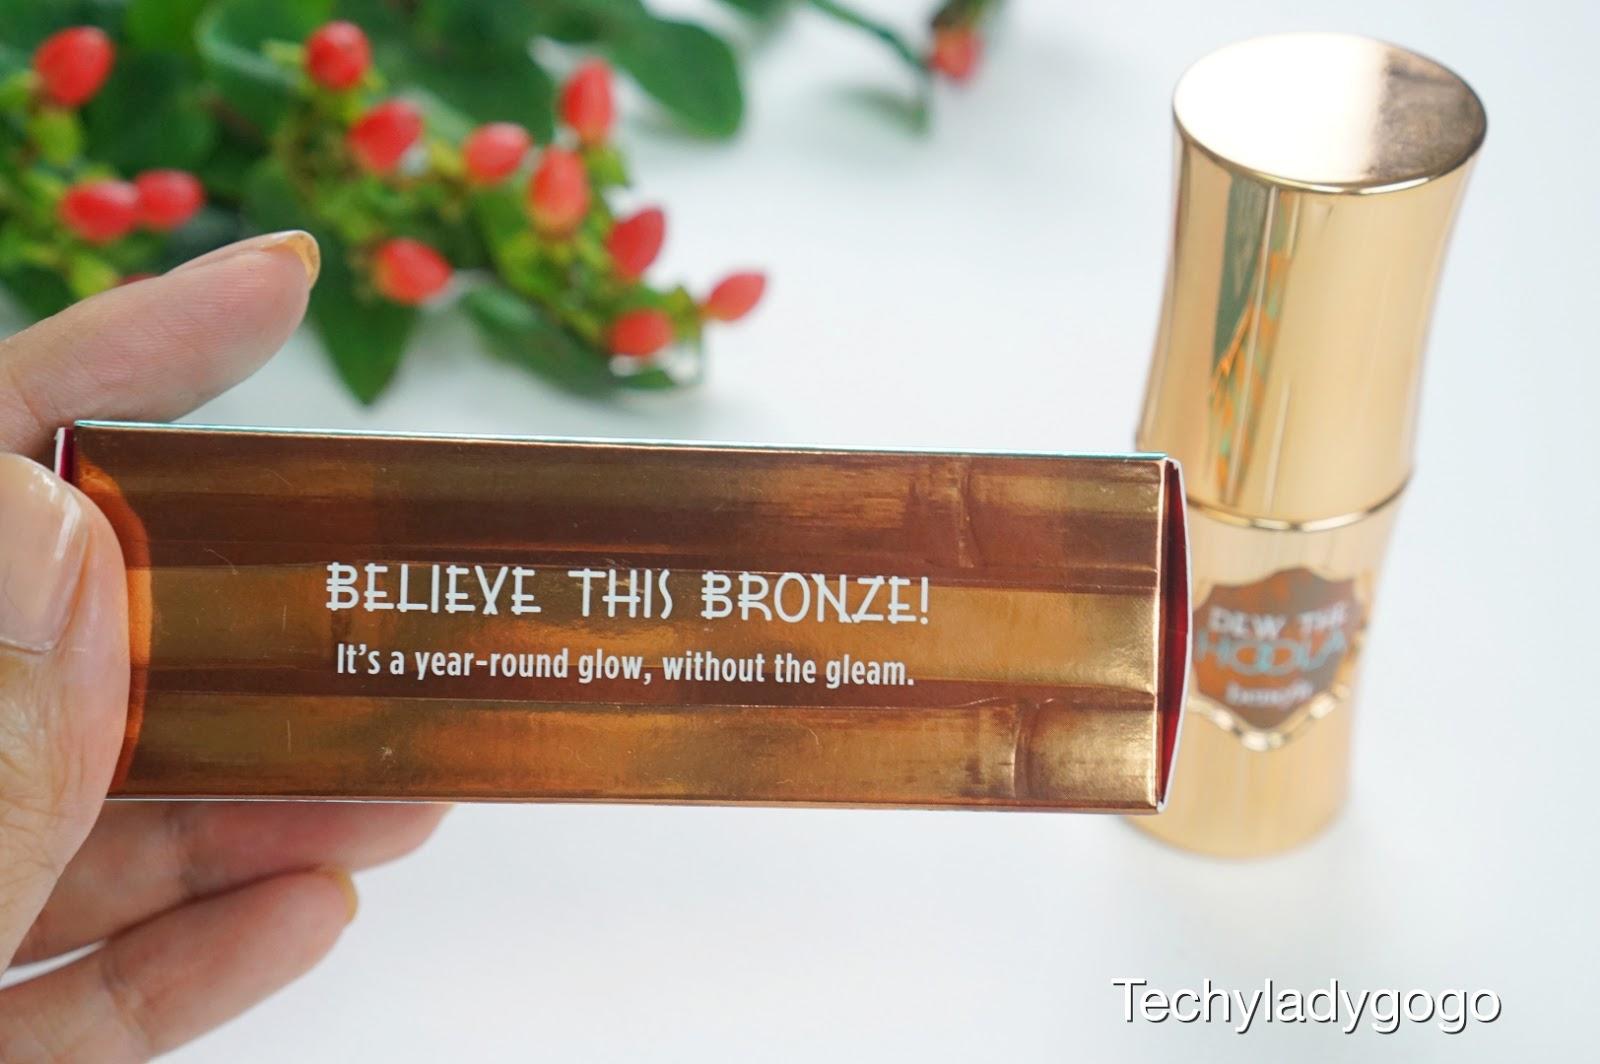 Benefit Dew The Hoola Liquid Bronzer รีวิวบรอนเซอร์ชนิดเหลว soft matte ผิวโกลว์ได้ทั้งปี ไม่ง้อแดด